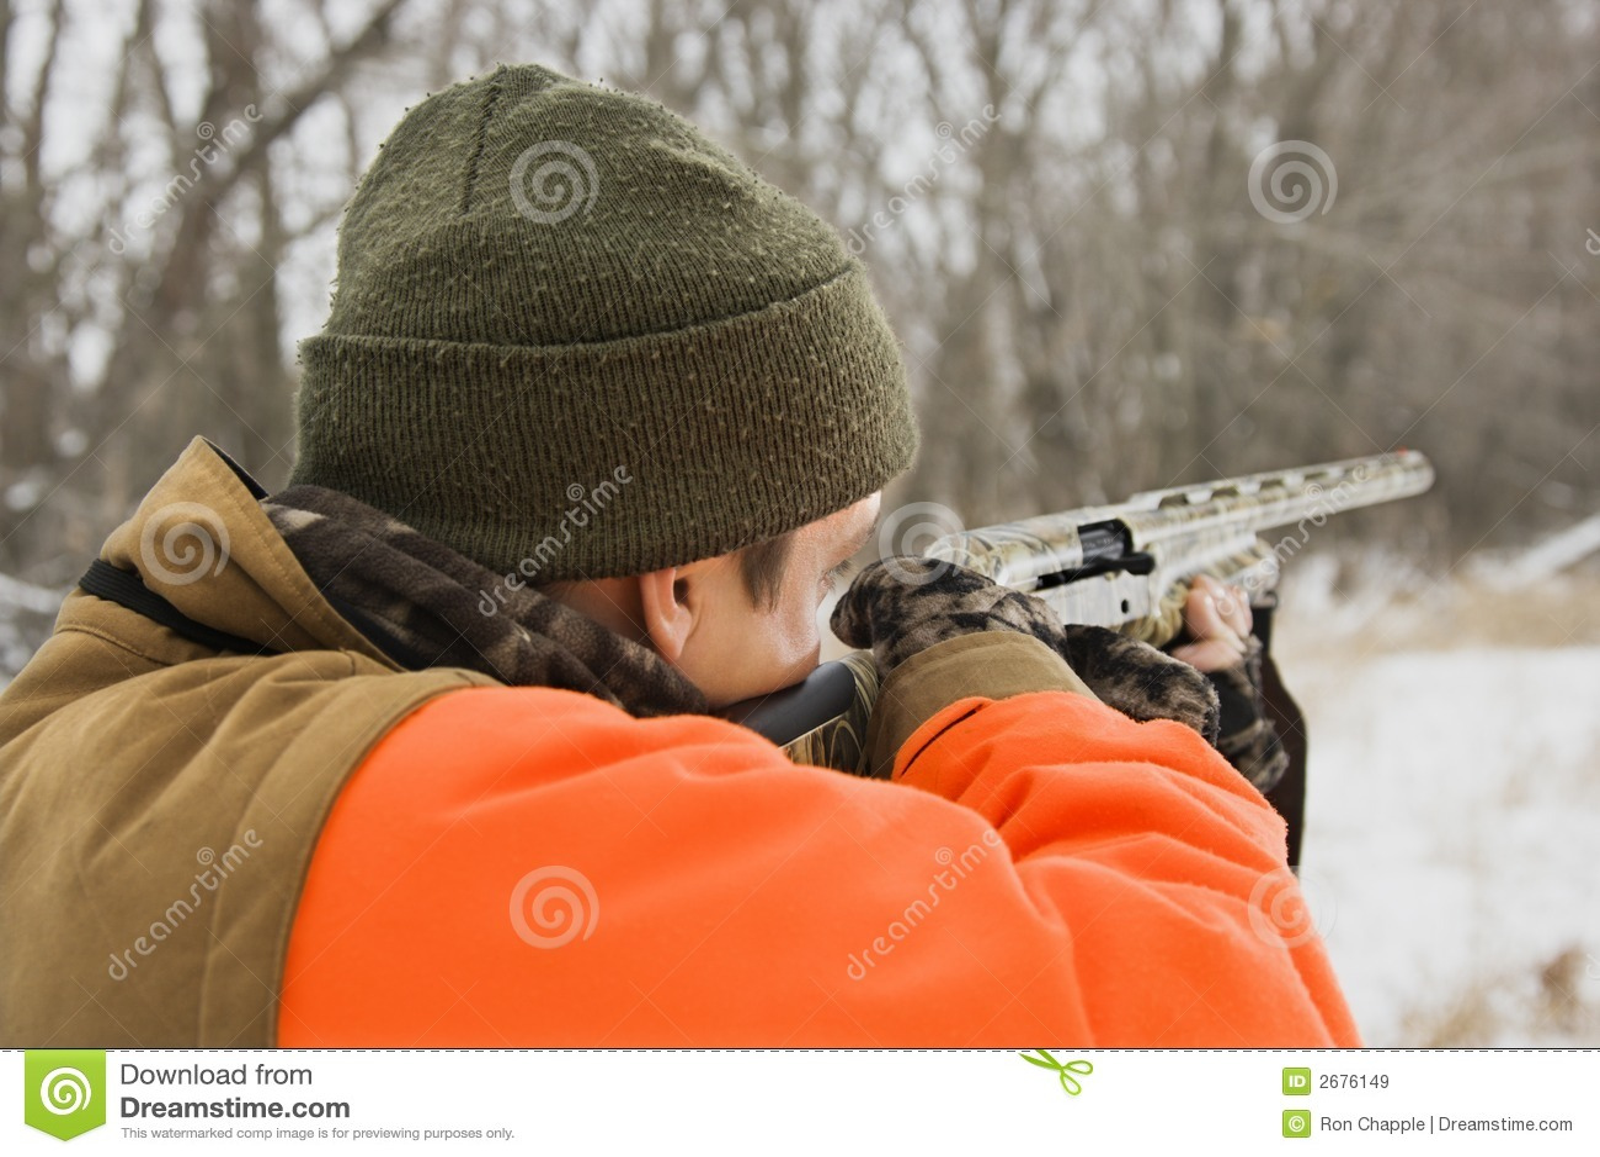 Man Aiming Shotgun. Royalty Free Stock Images - Image: 2676149